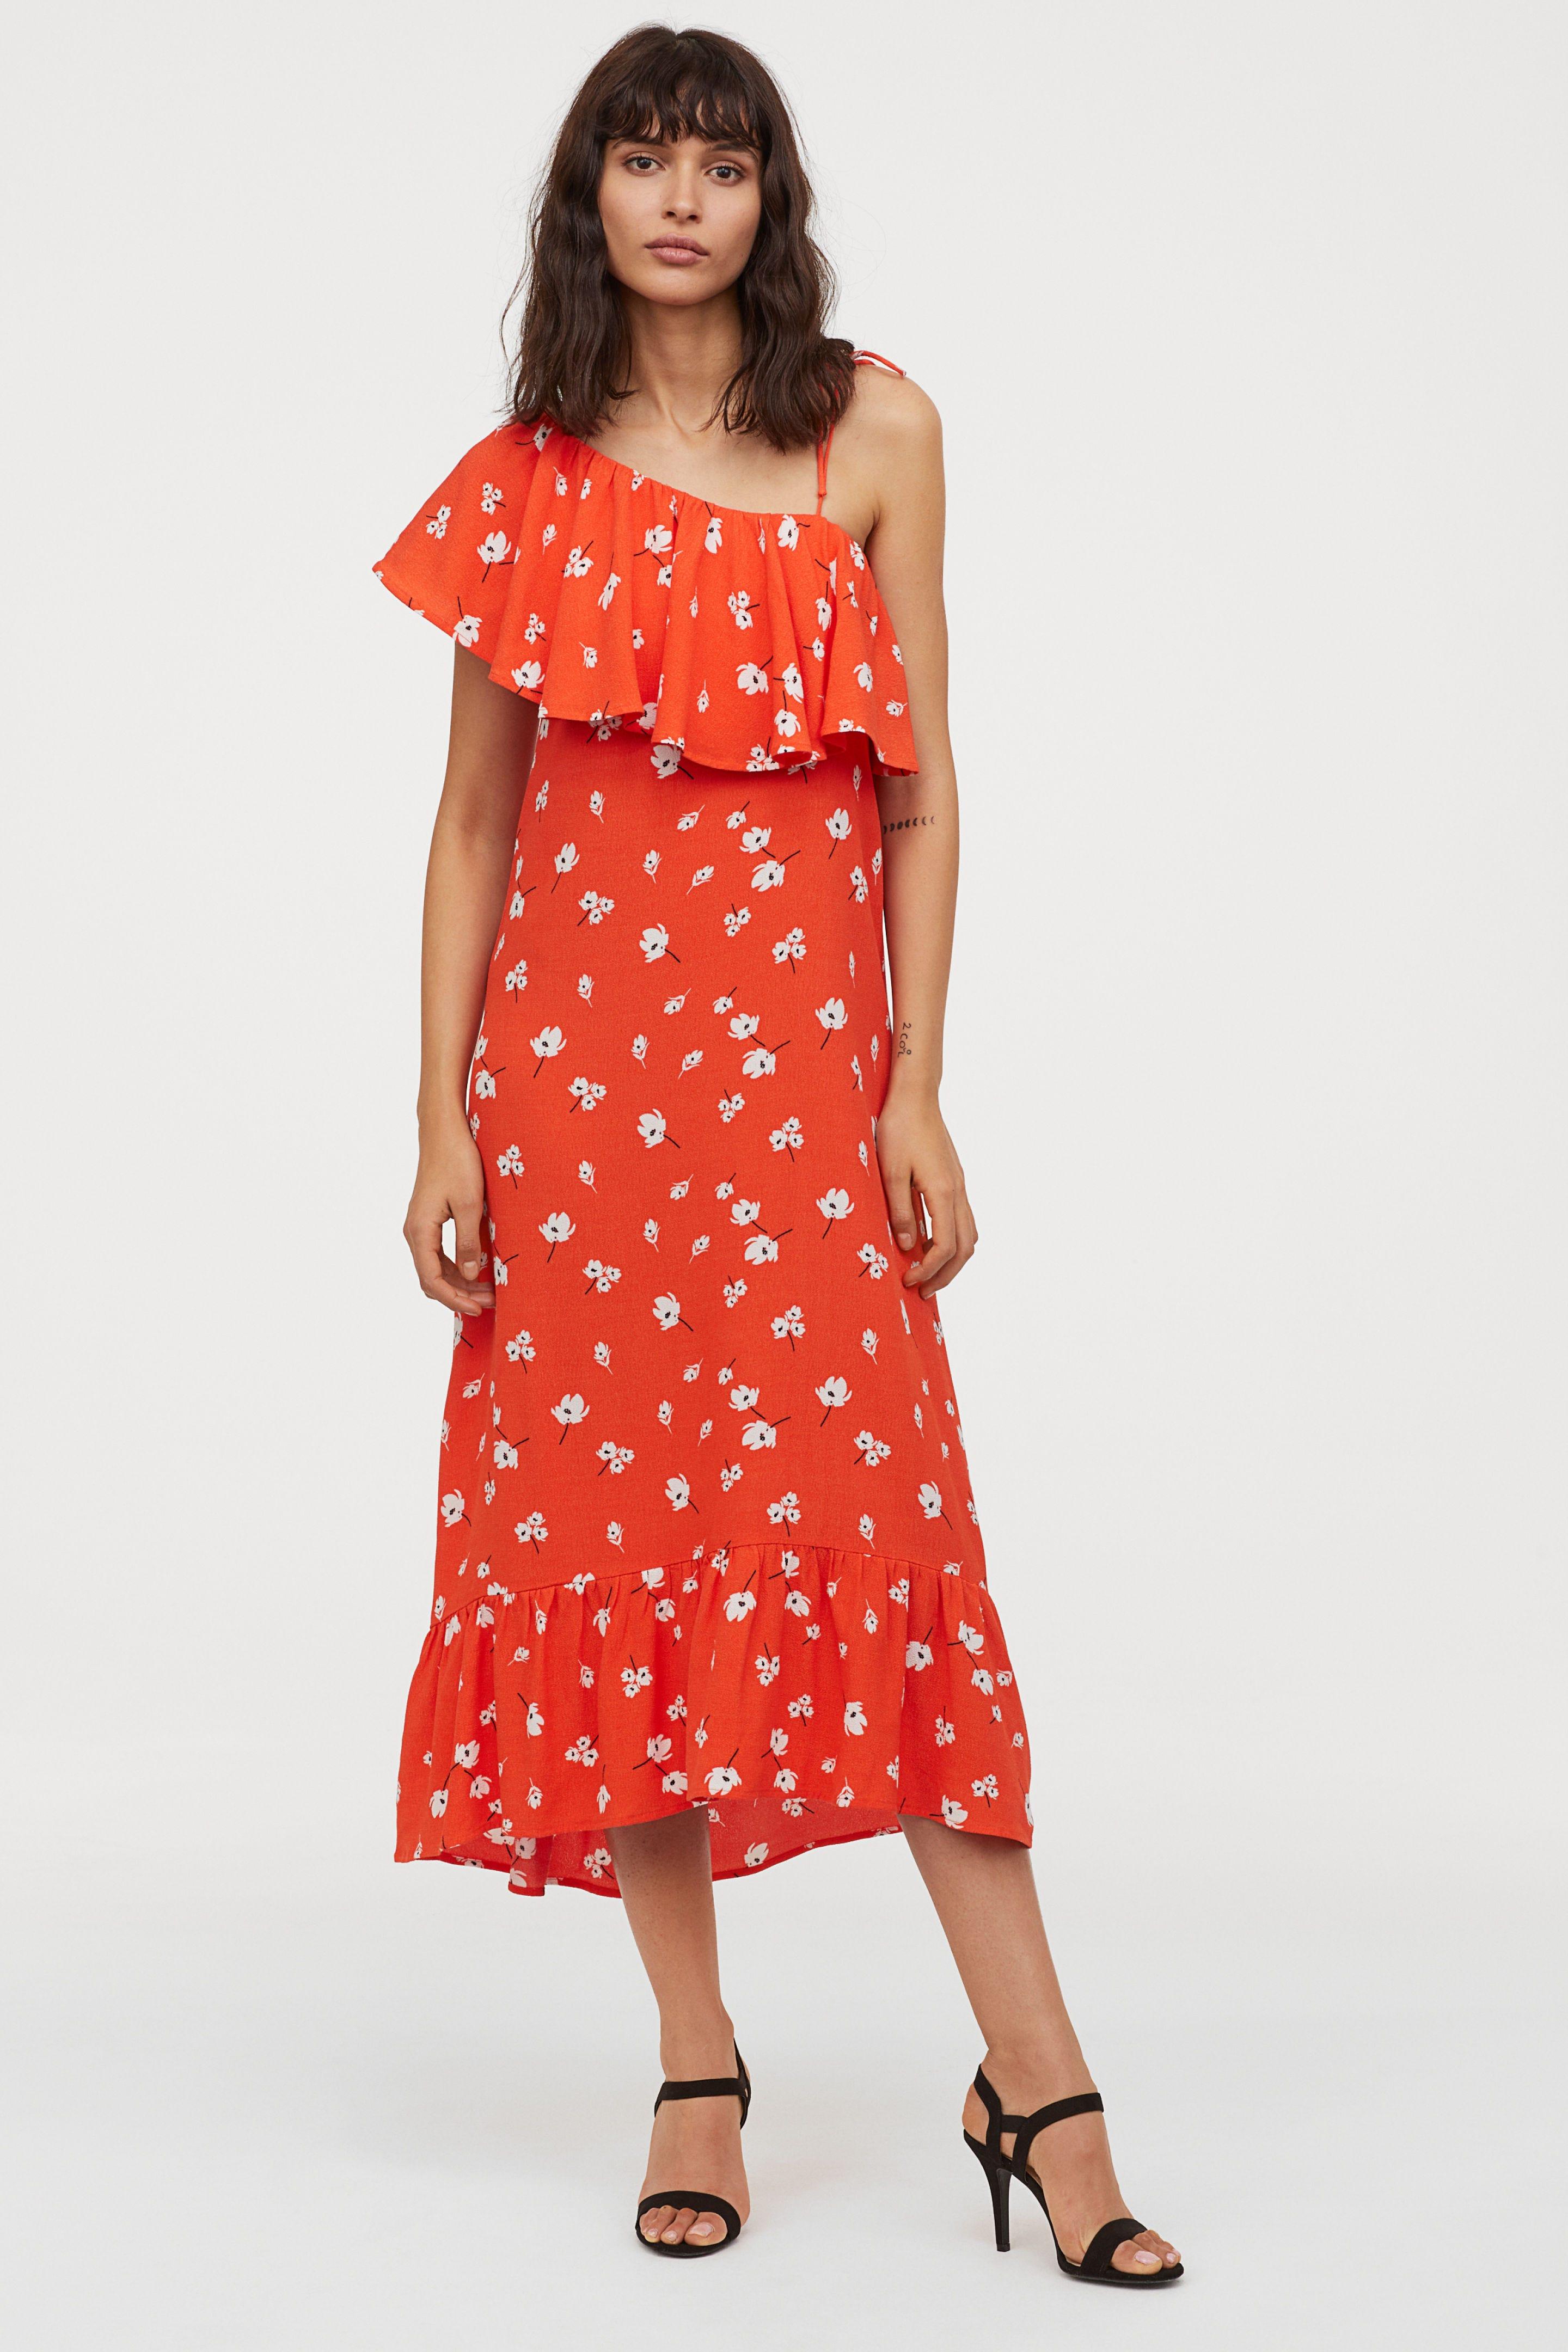 Dresses H M Dress Women's Clothing